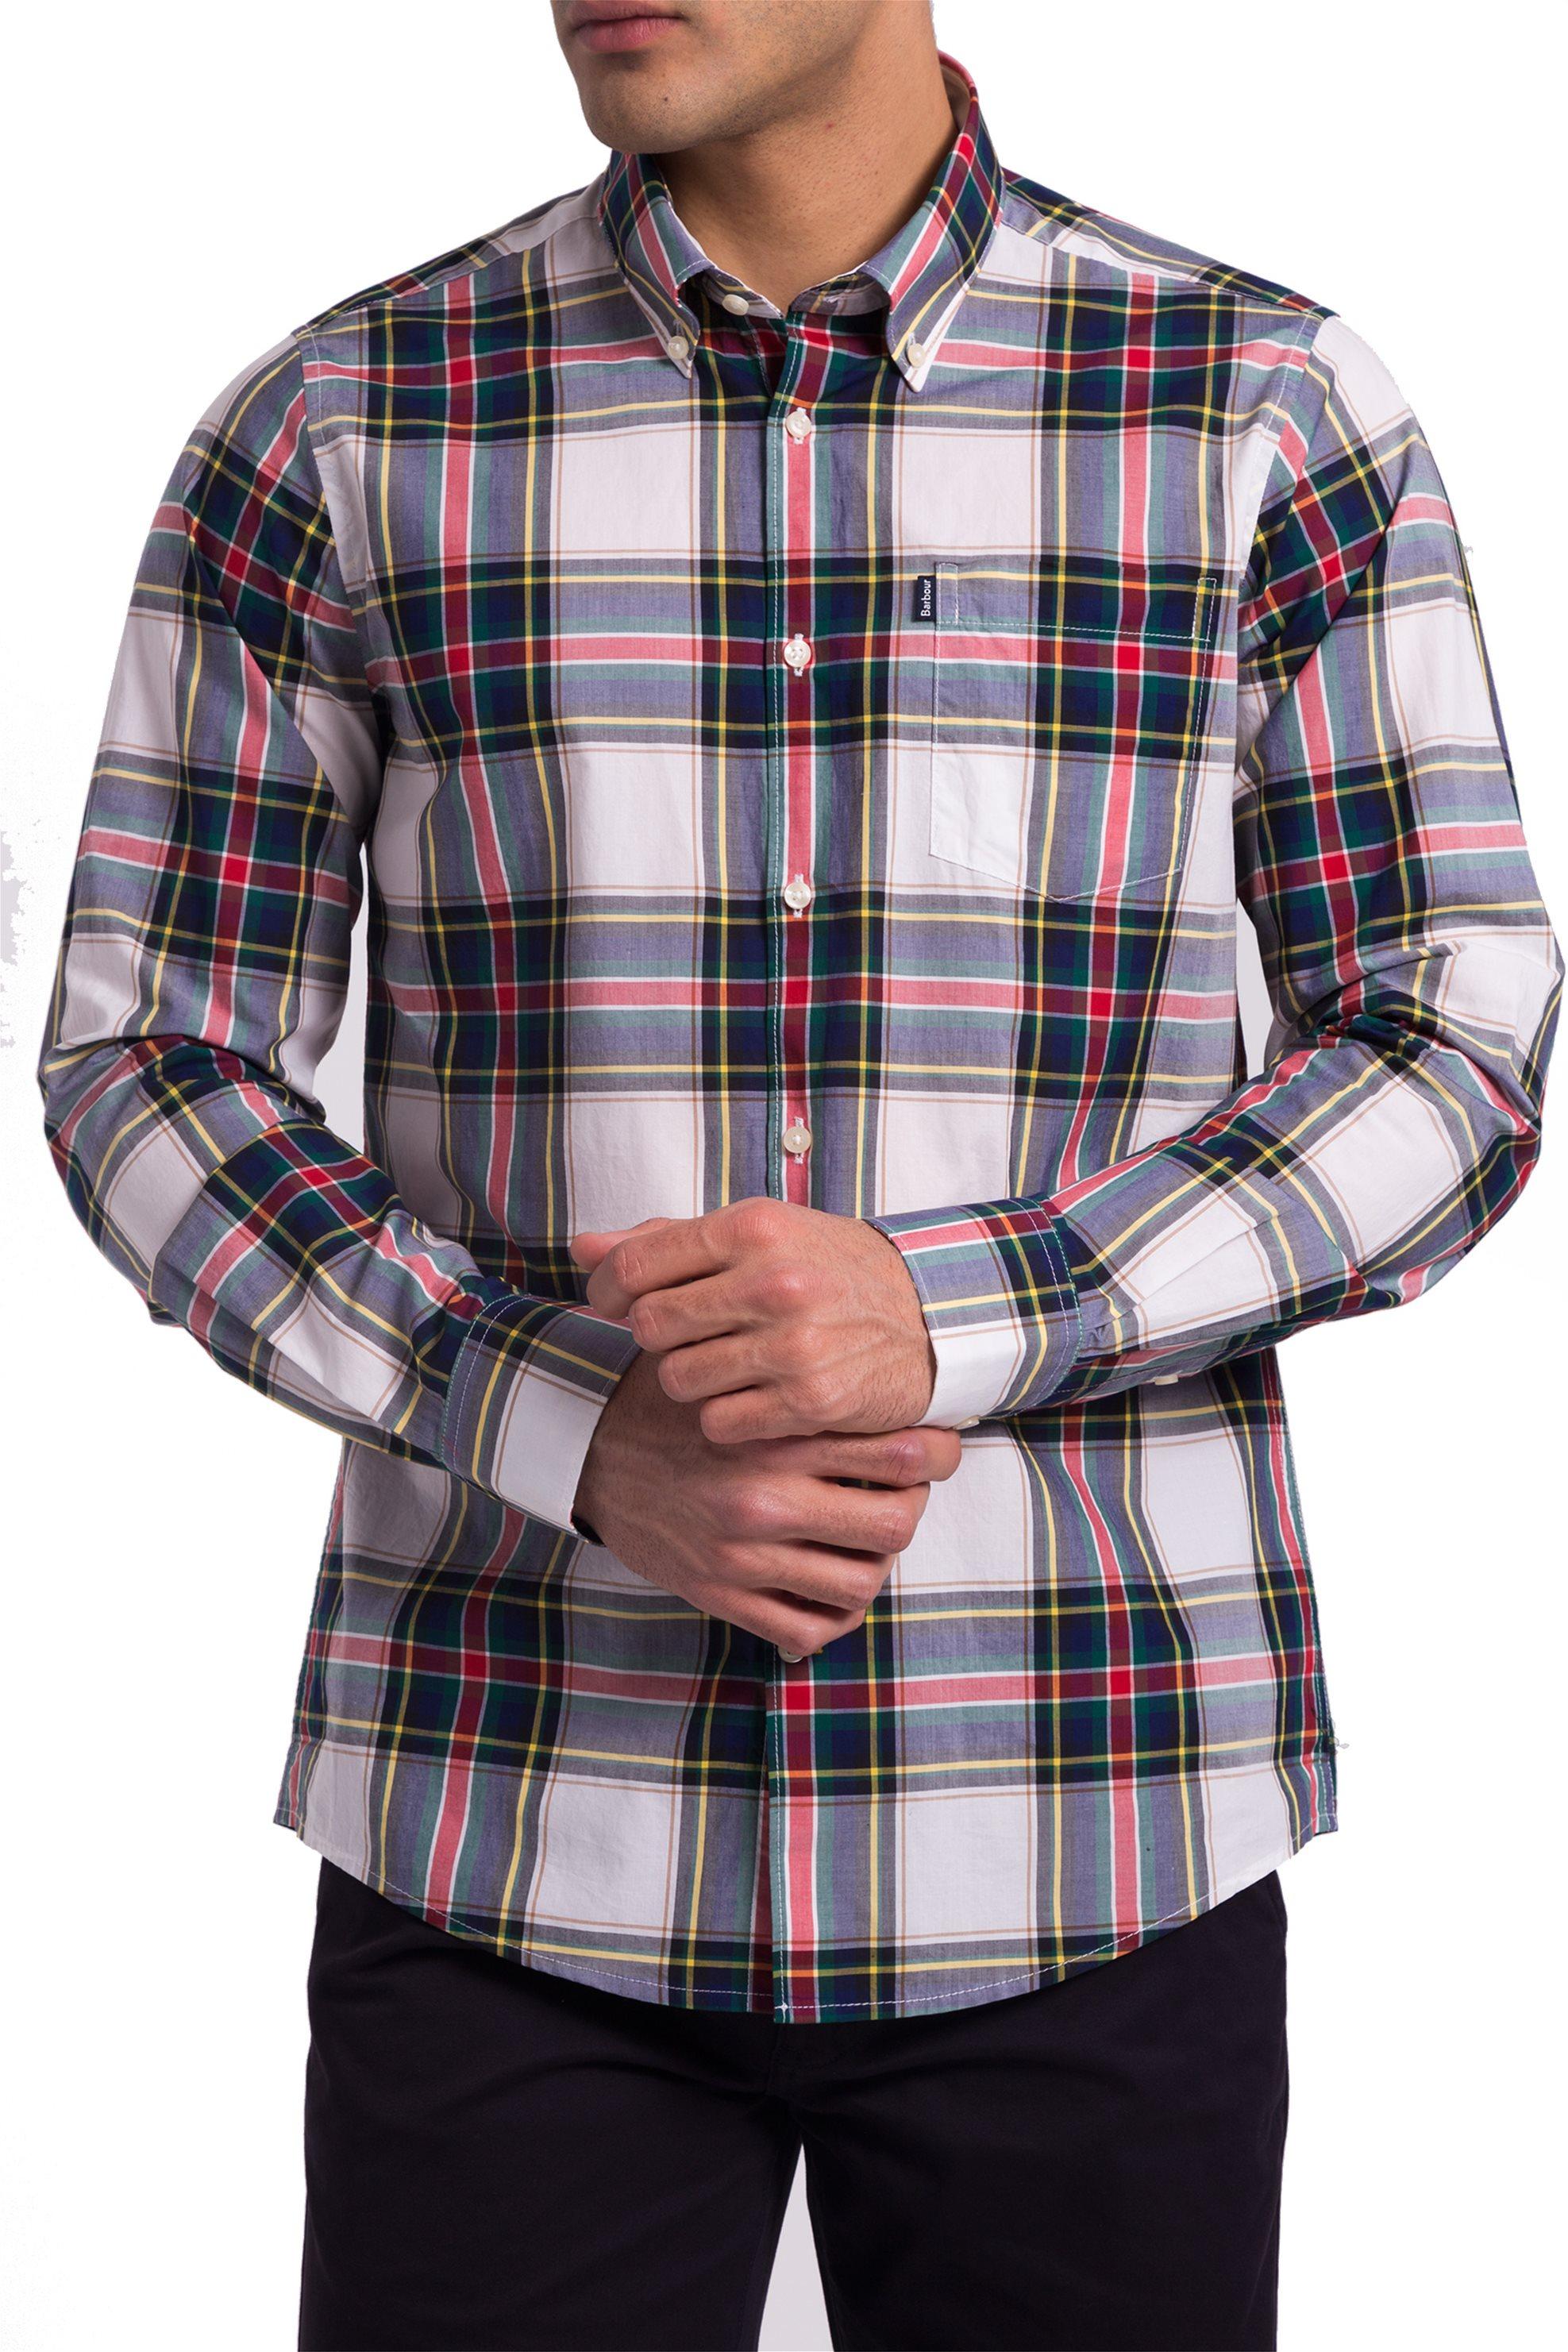 2ccbe4ba92e2 Ανδρικό καρό πουκάμισο Barbour - MSH4163 - Κόκκινο